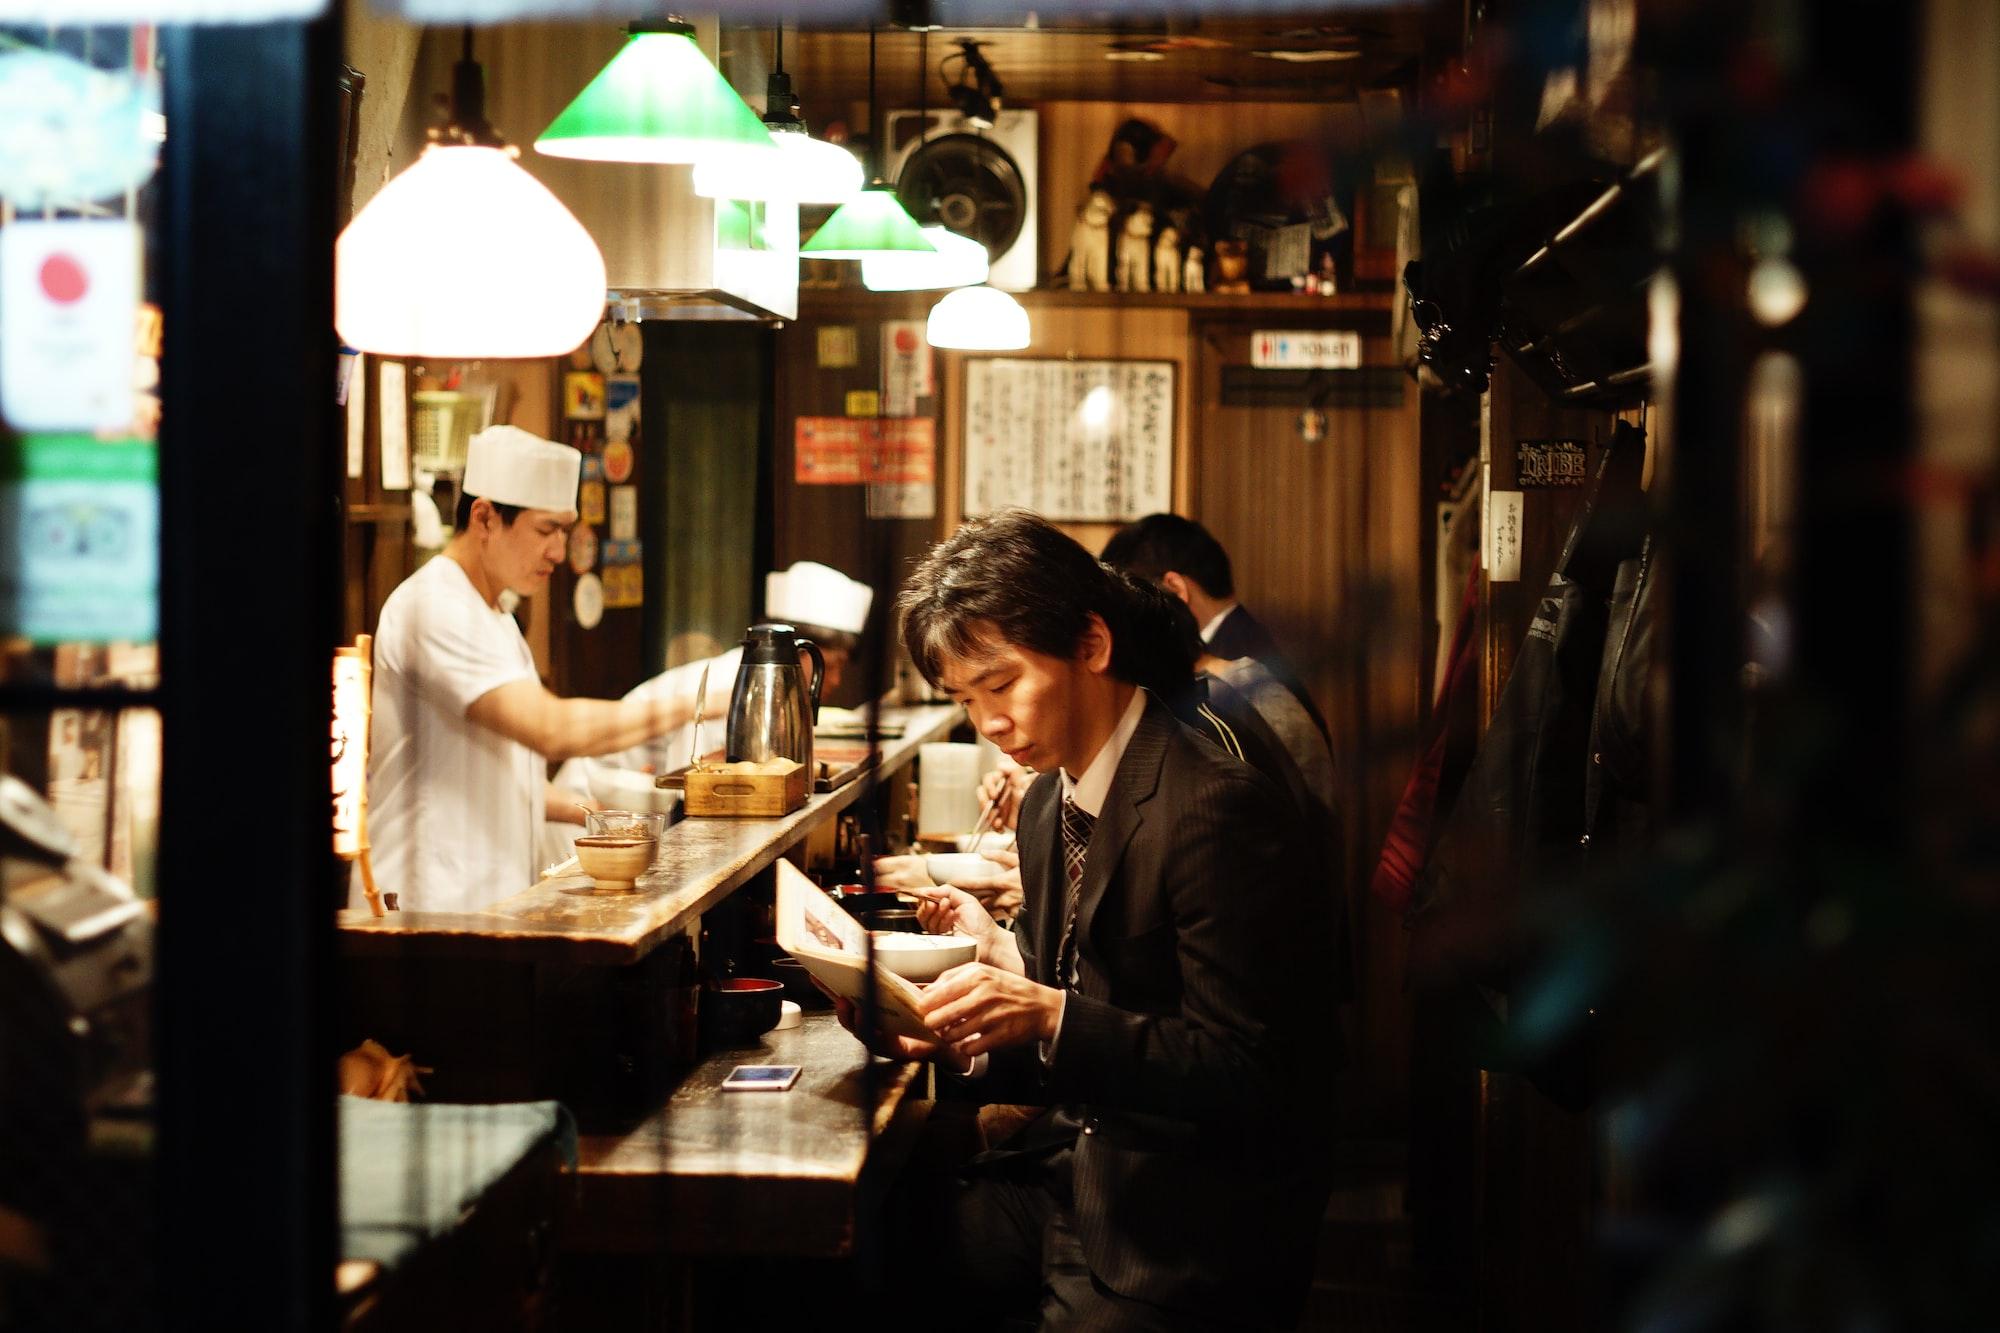 Dieta japonesa: Método, benefícios e cardápio